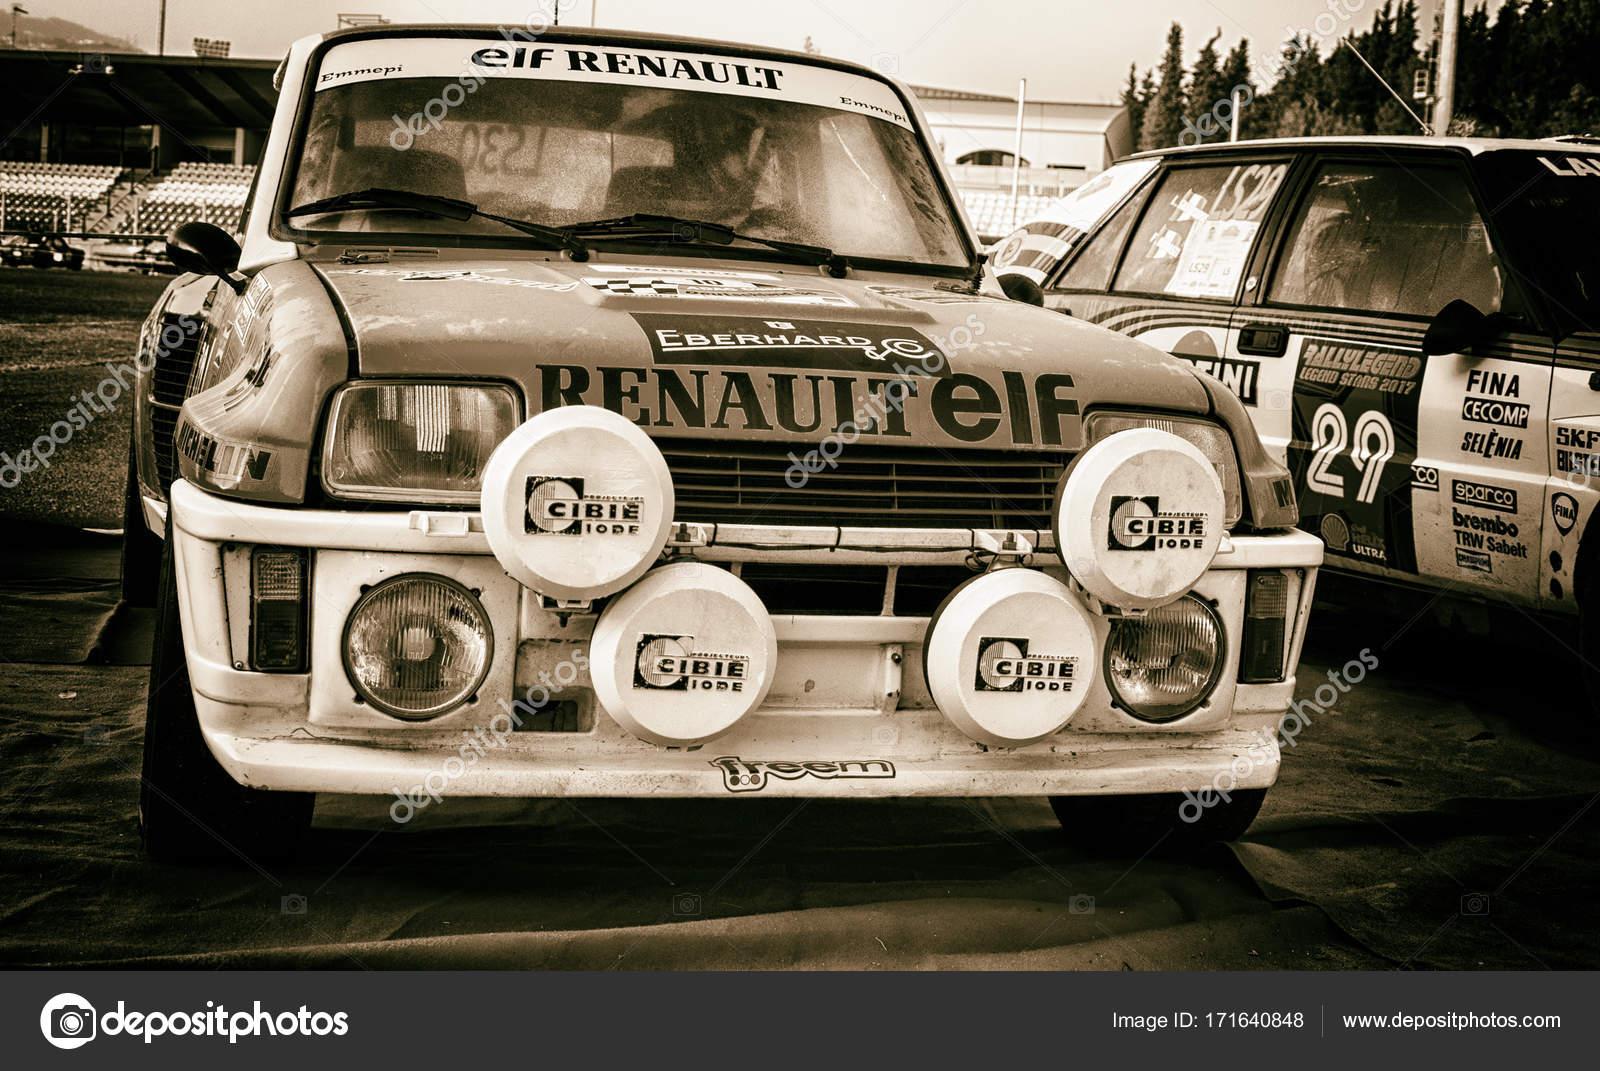 Renault 5 Gt Turbo 1982 Old Racing Car Rally Stock Editorial Photo C Massimocampa 171640848